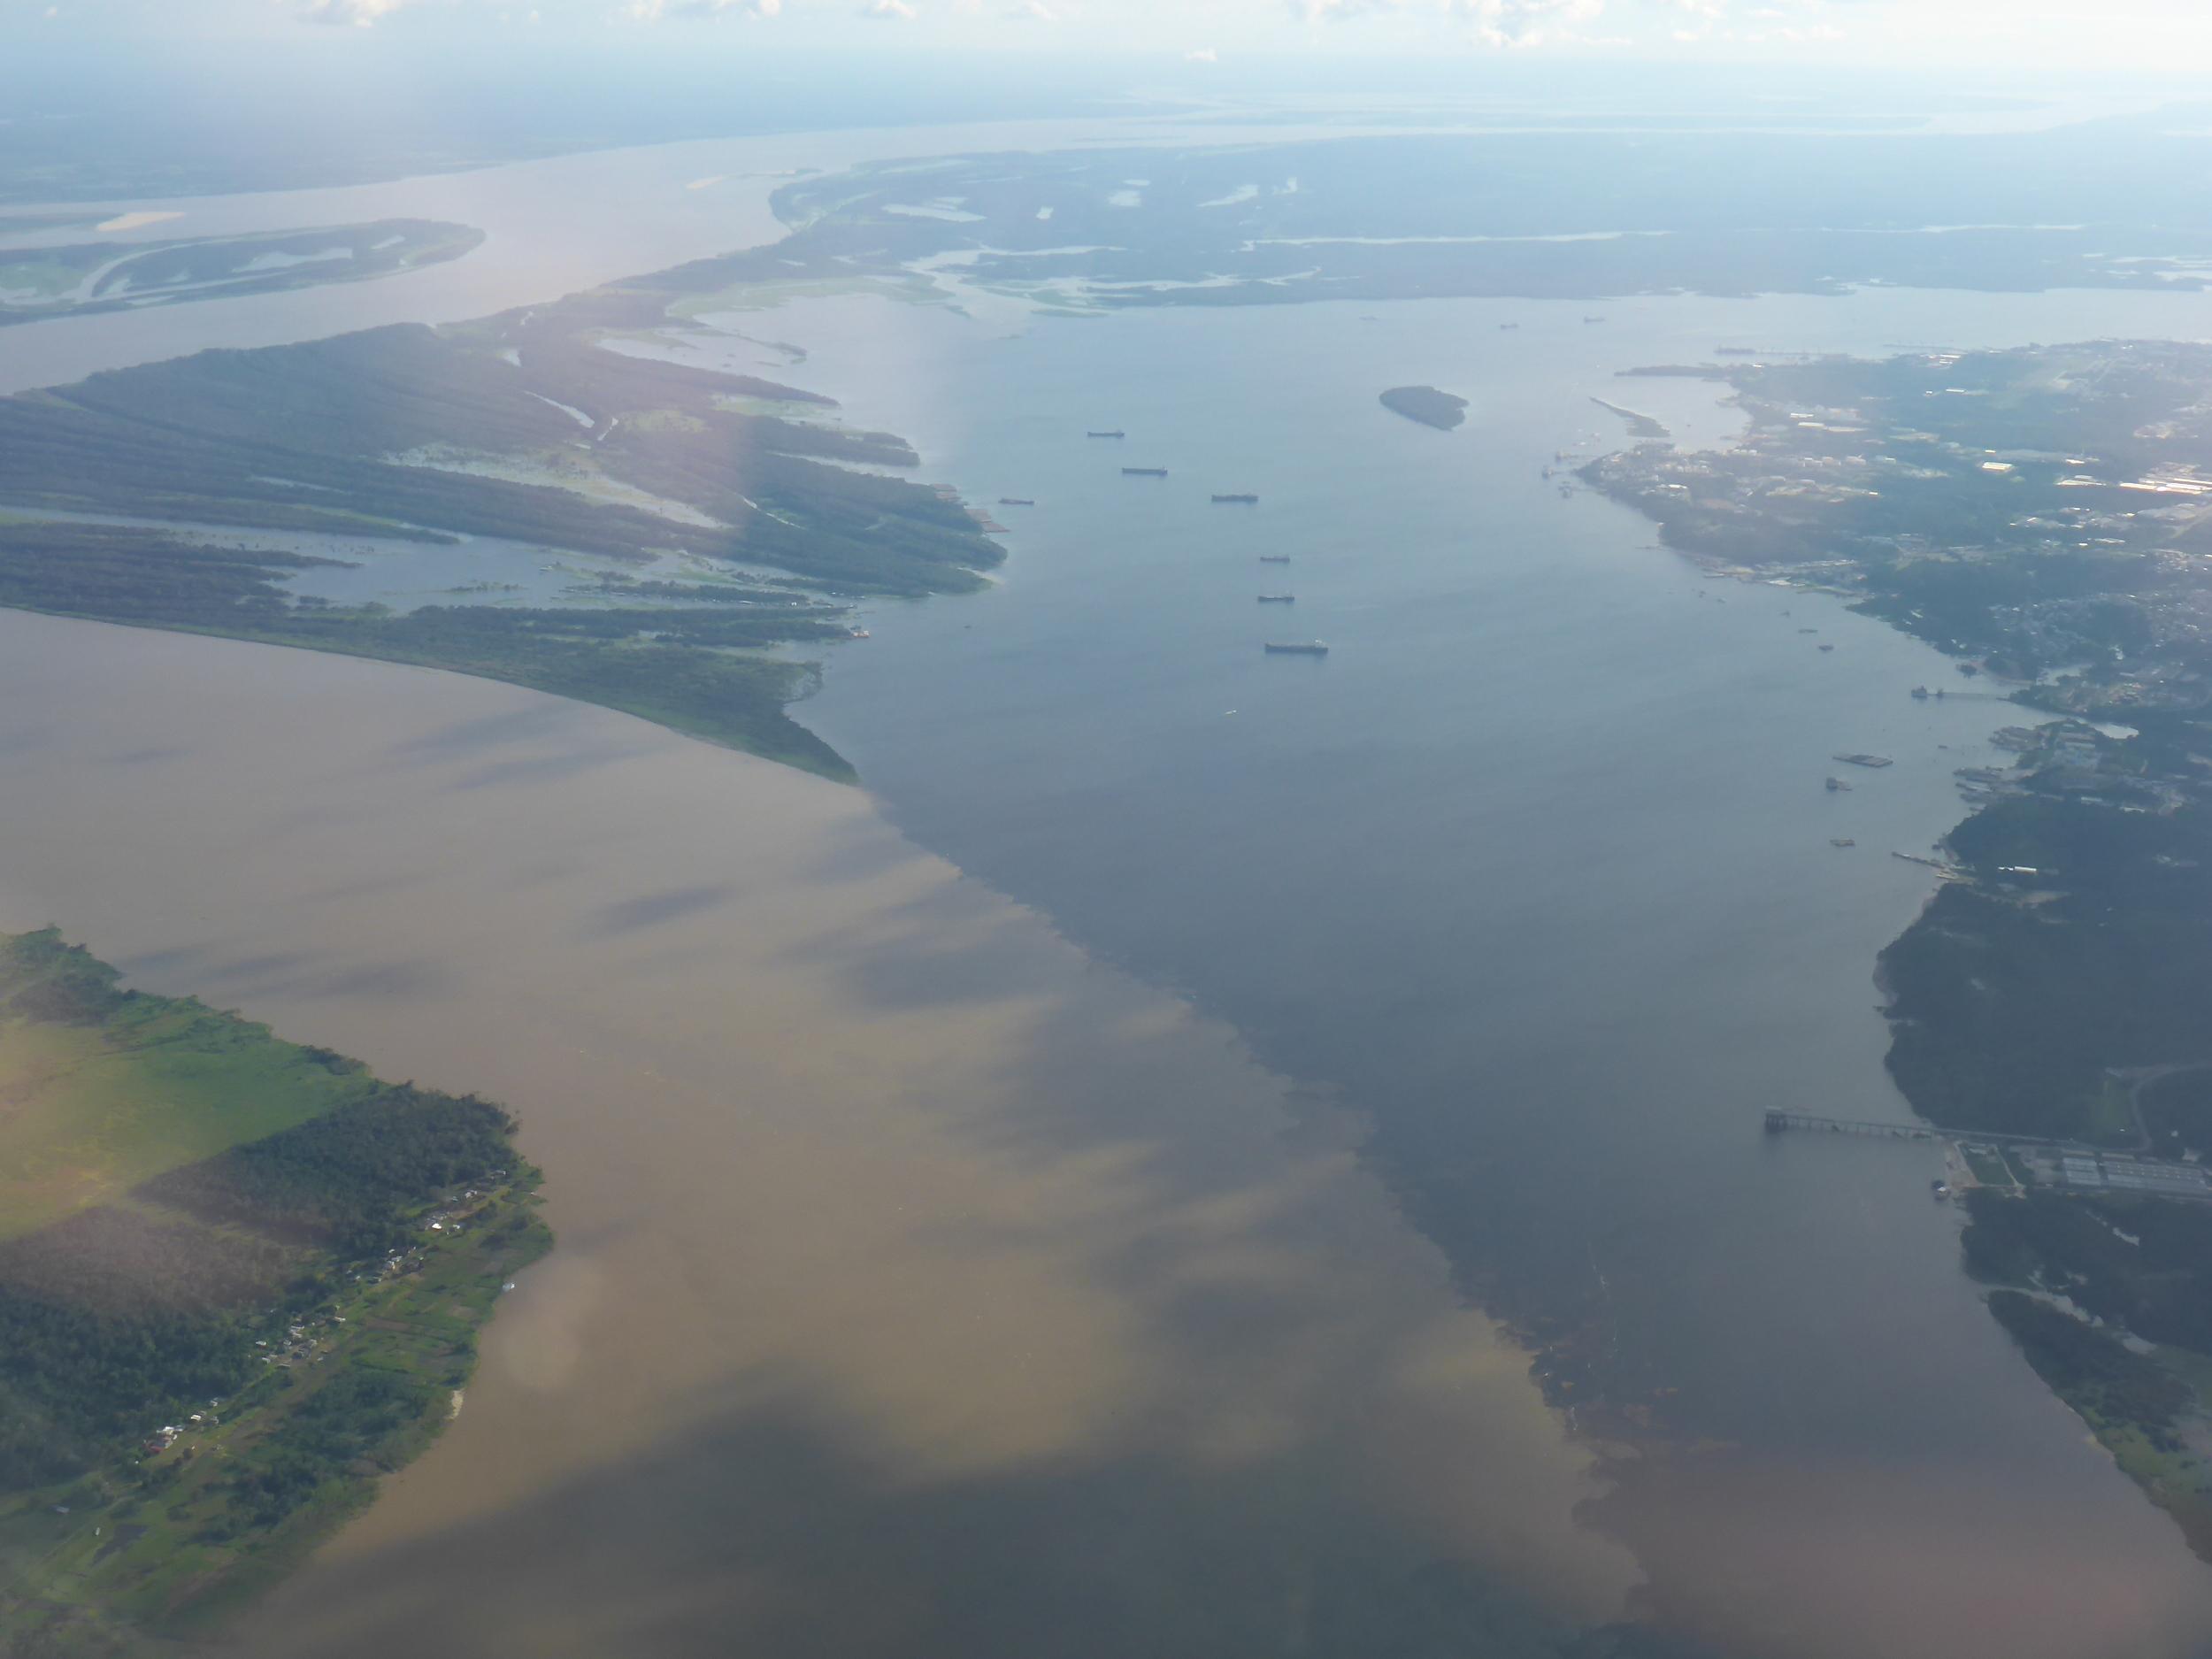 encontro das aguas - 'meeting of waters' where the rio negro and rio solimoes meet near manaus